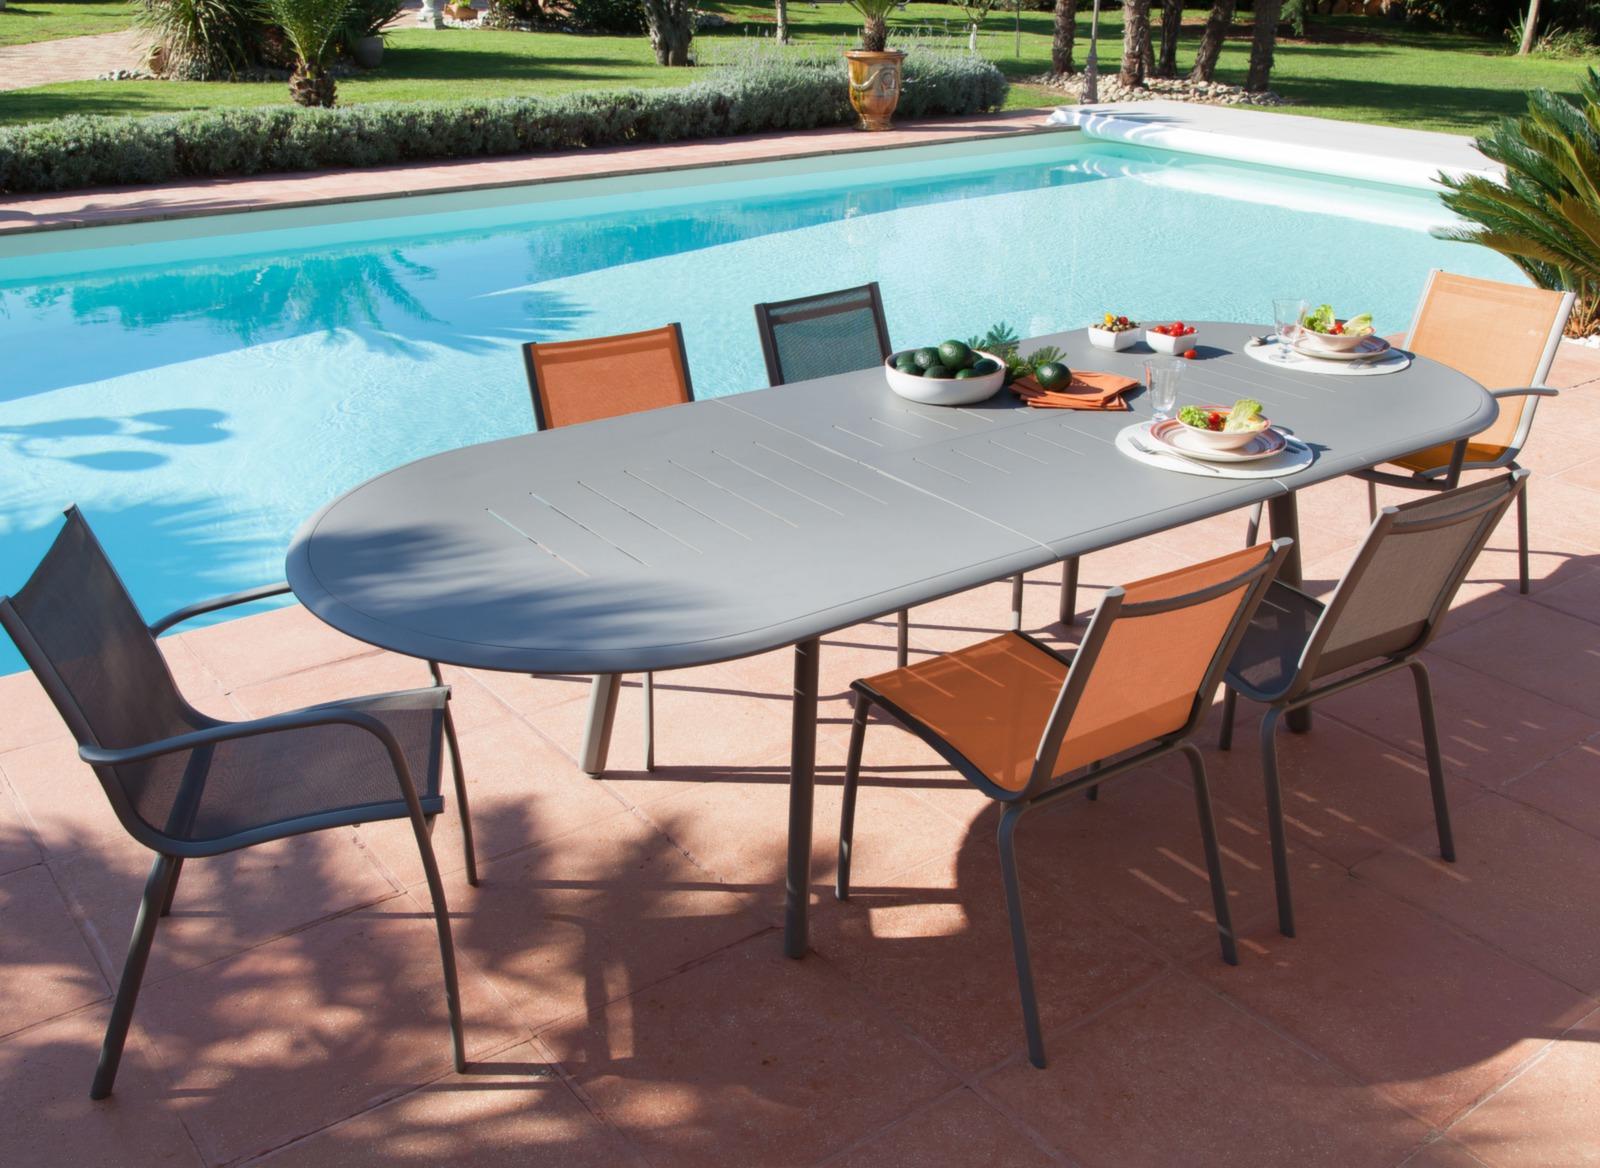 table brasa 150 200 cm tables extensibles mobilier de jardin en ligne meubles de jardin. Black Bedroom Furniture Sets. Home Design Ideas